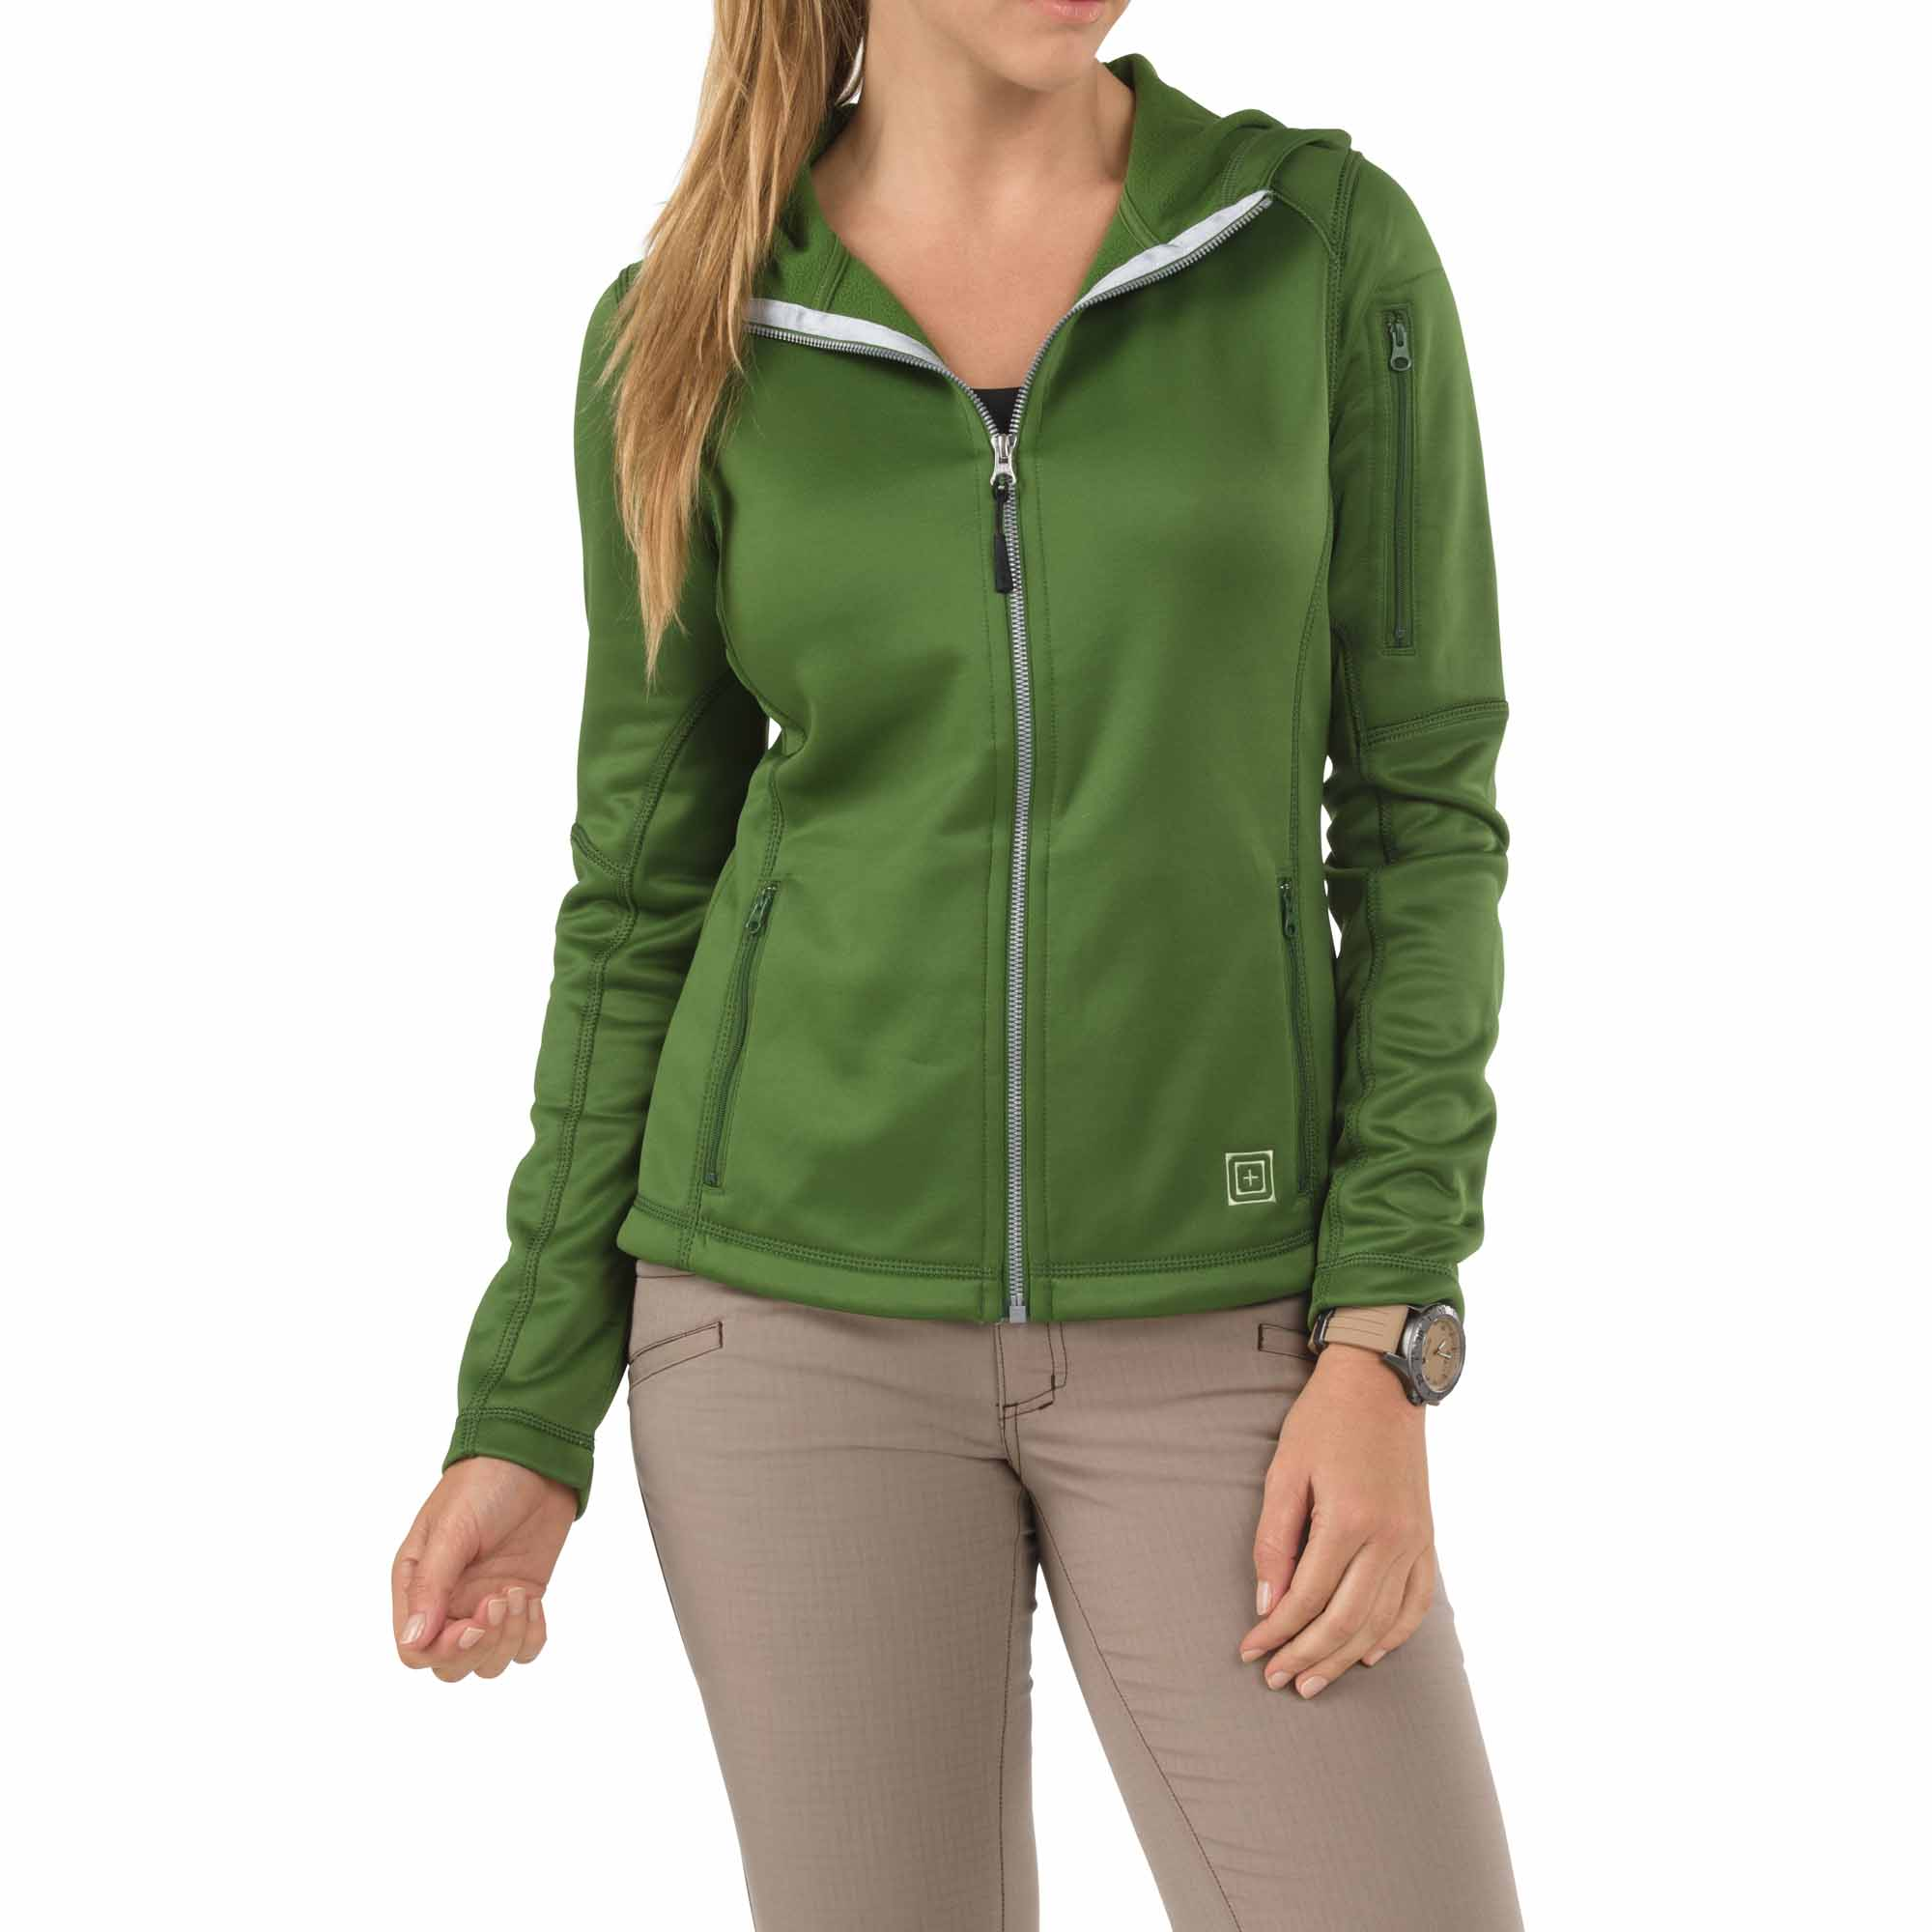 5.11 Tactical Women's Women's Horizon Hoodie (Green)